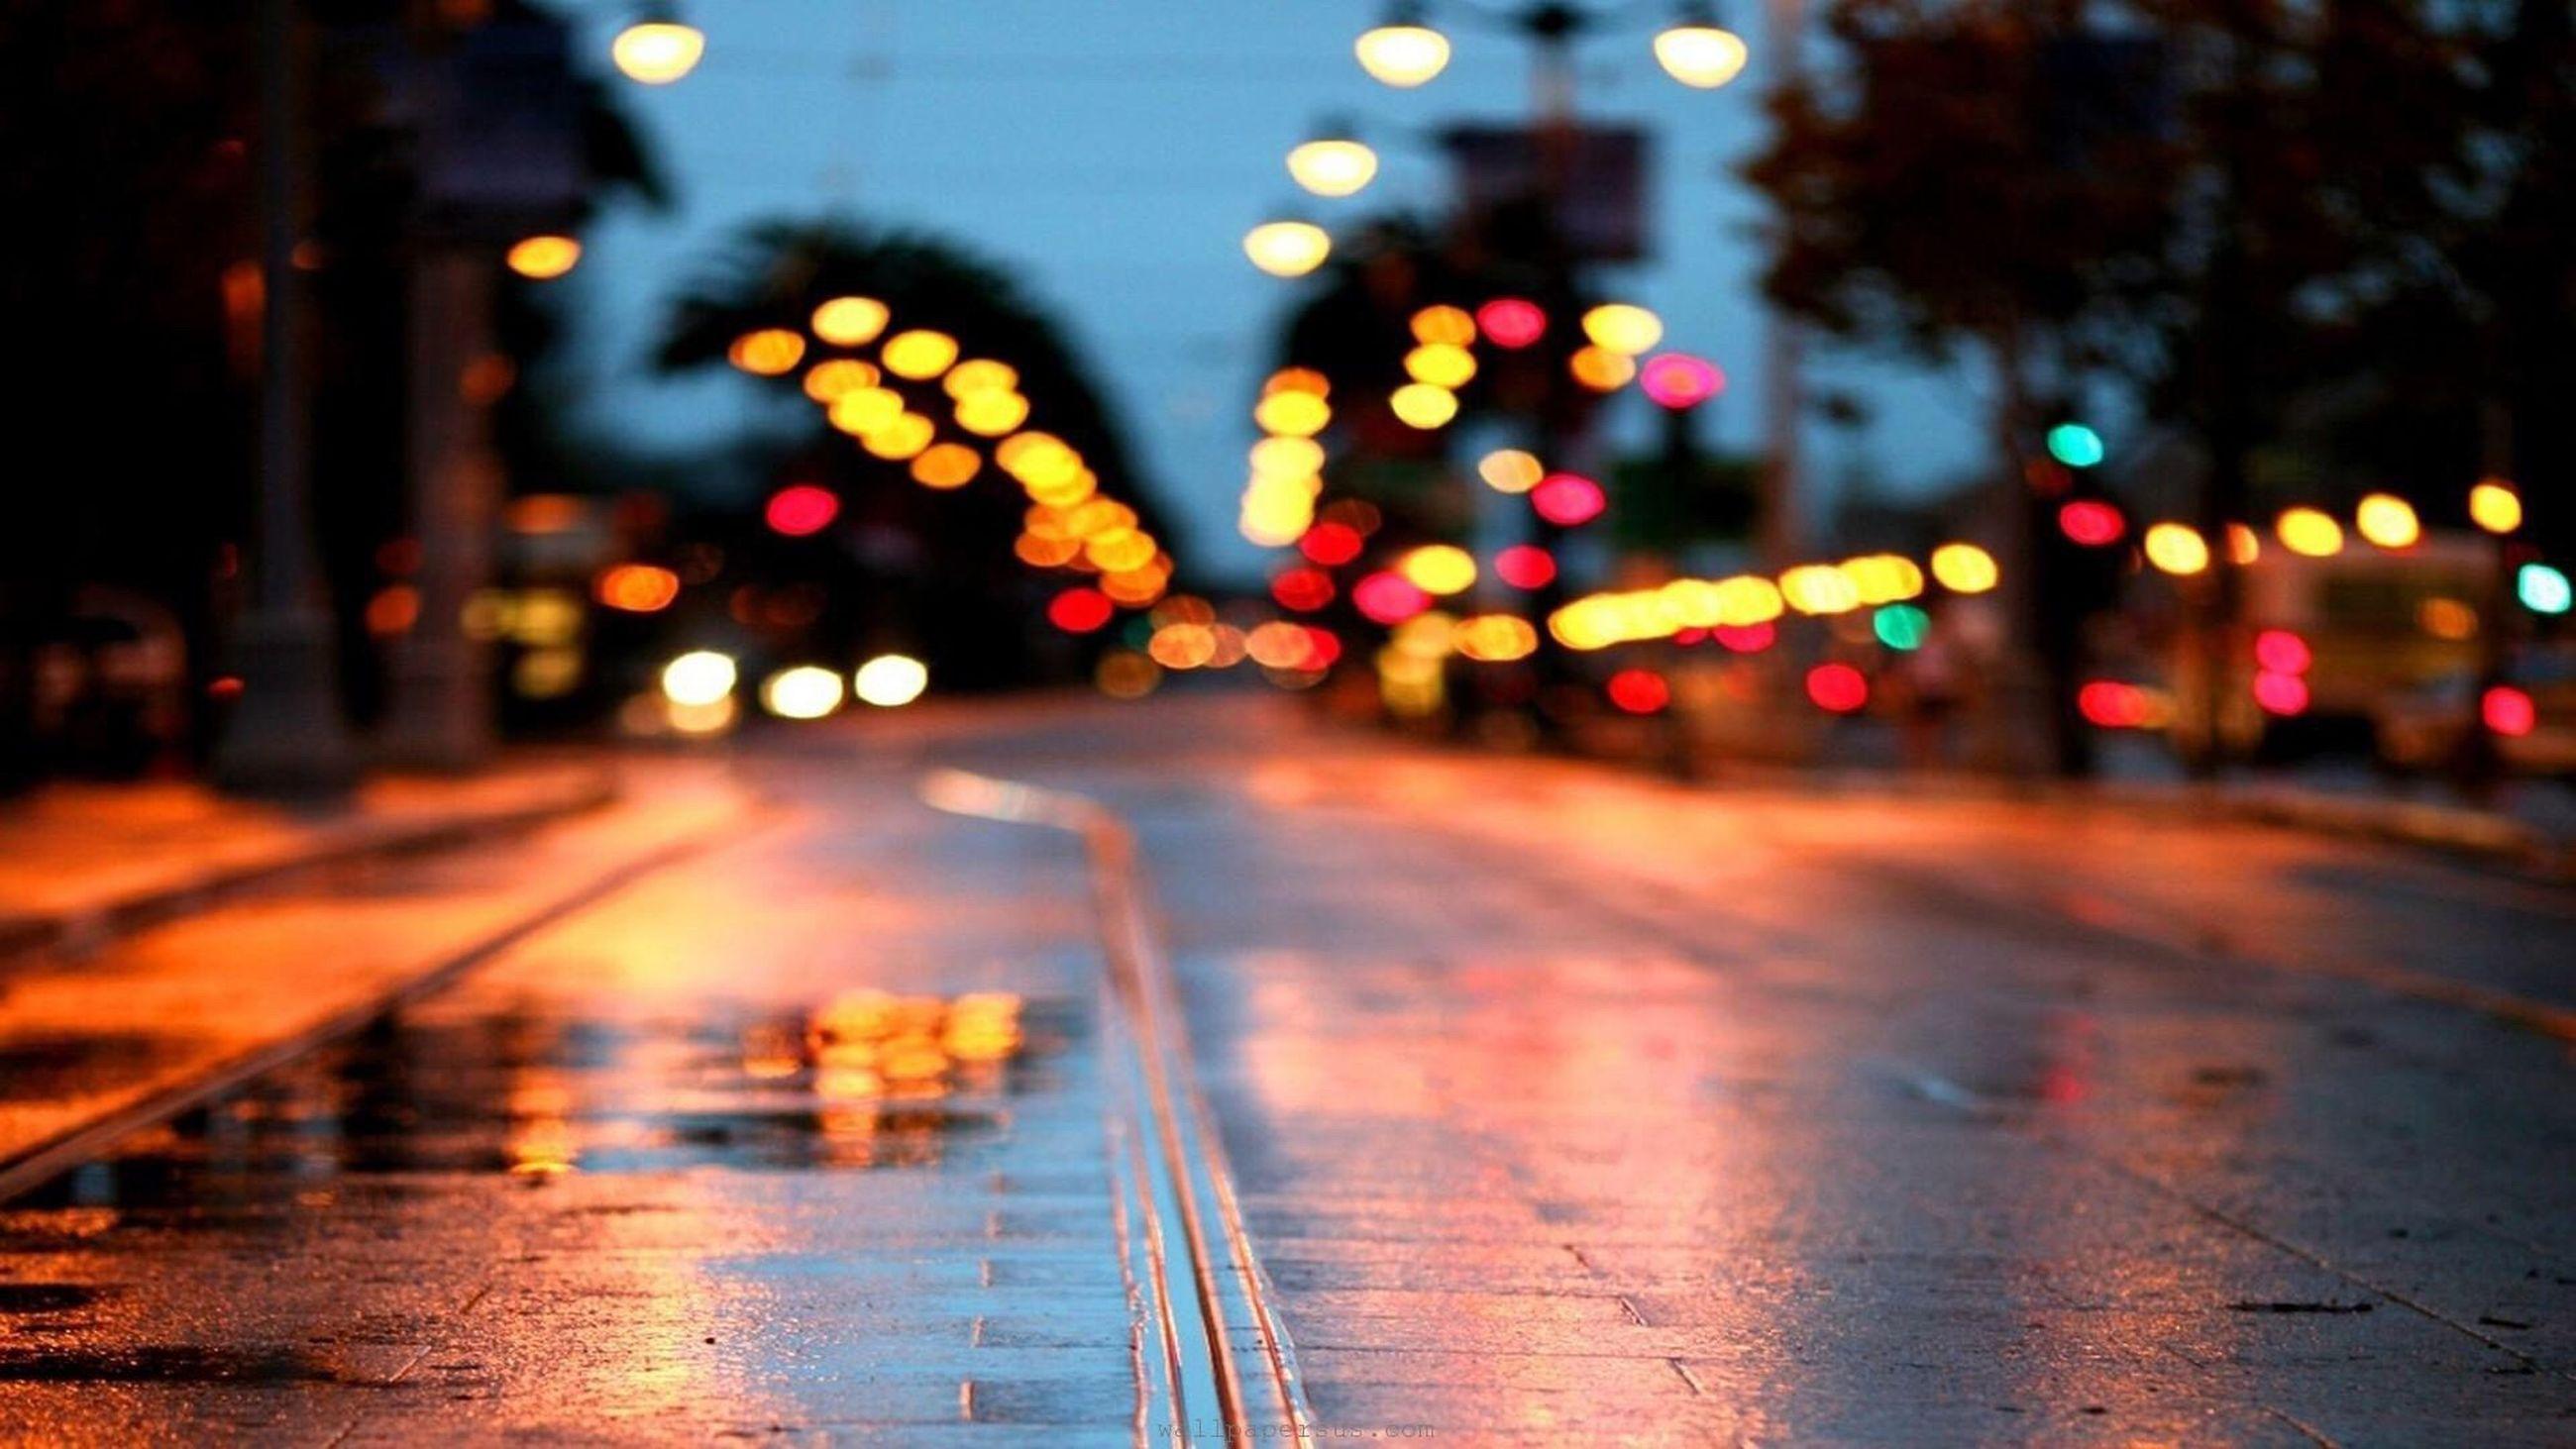 illuminated, transportation, night, street, defocused, city street, land vehicle, no people, city, road, outdoors, roadways, close-up